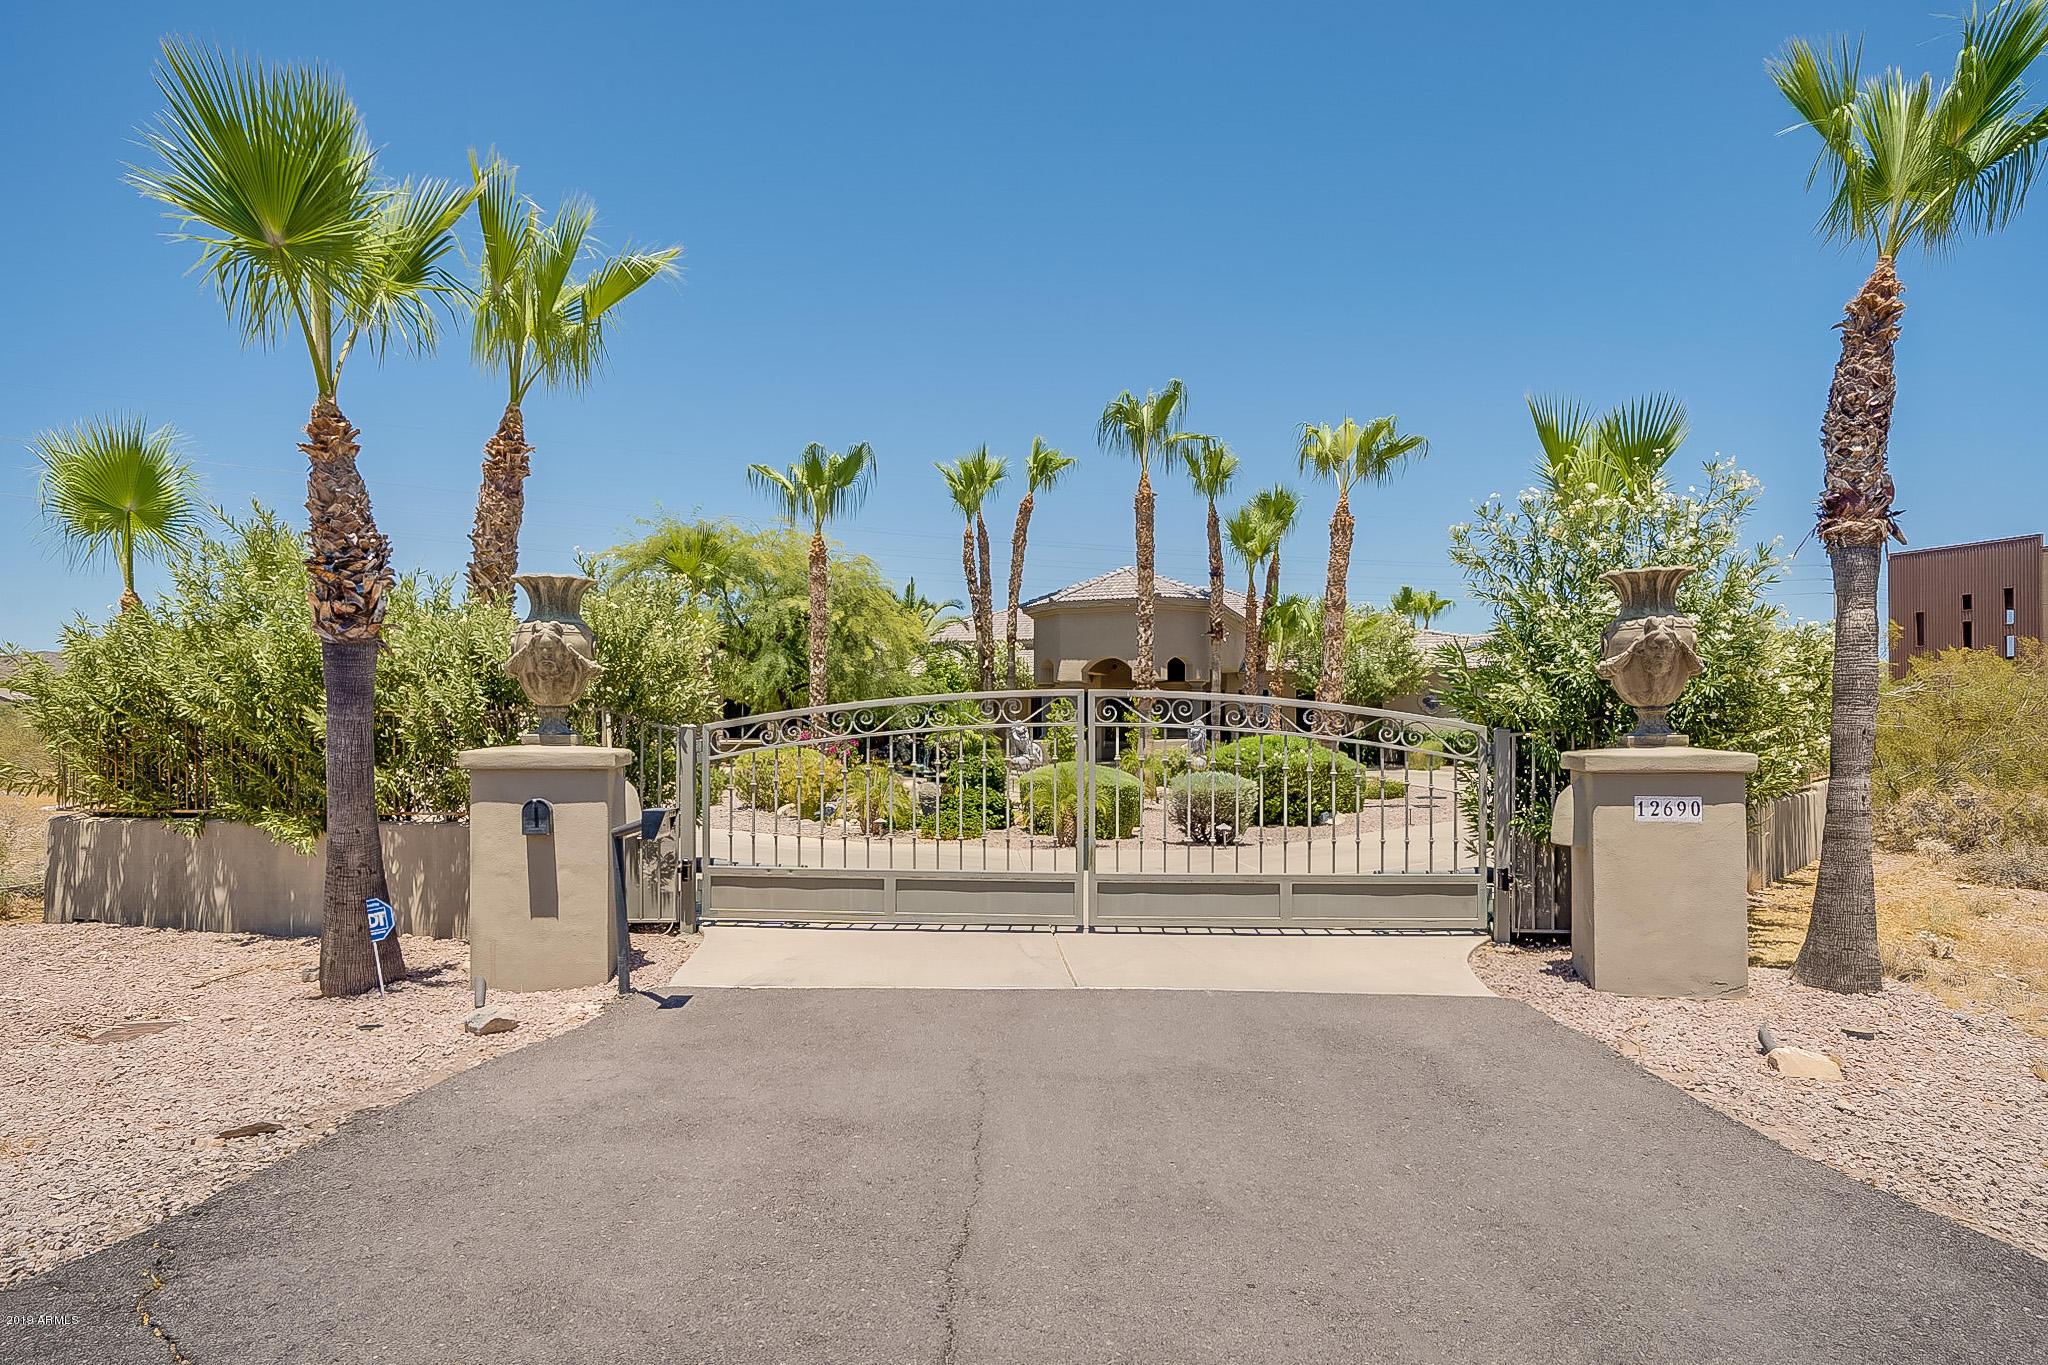 Photo of 12690 E COCHISE Drive, Scottsdale, AZ 85259